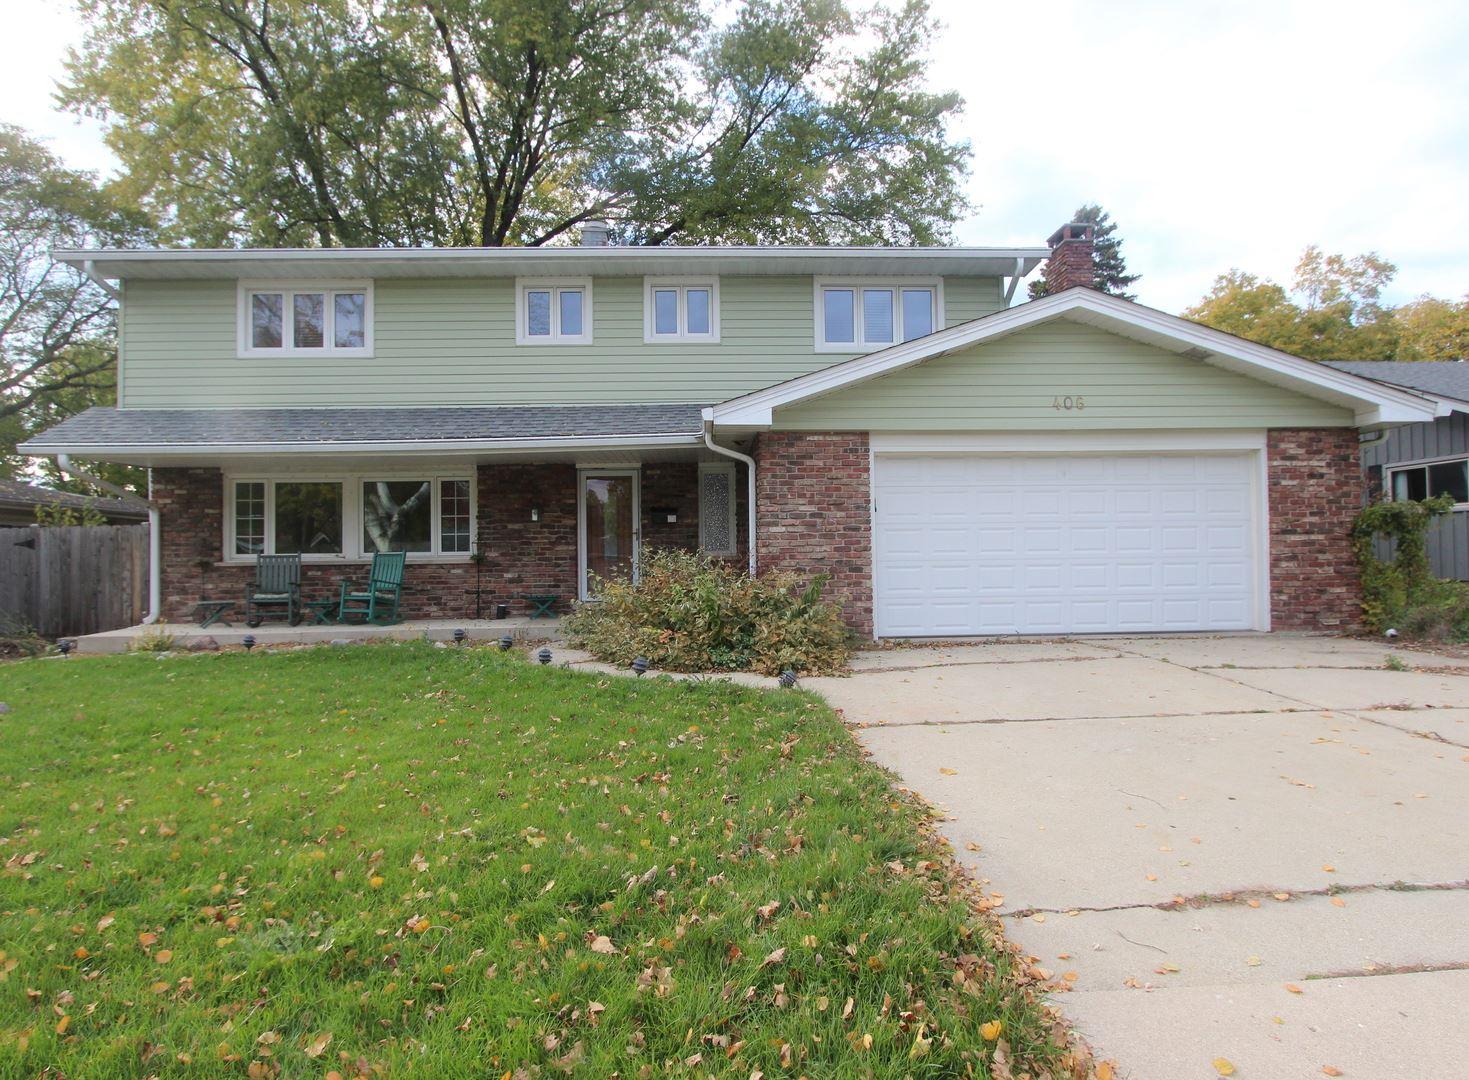 406 Keith Avenue, Crystal Lake, IL 60014 - #: 11205060